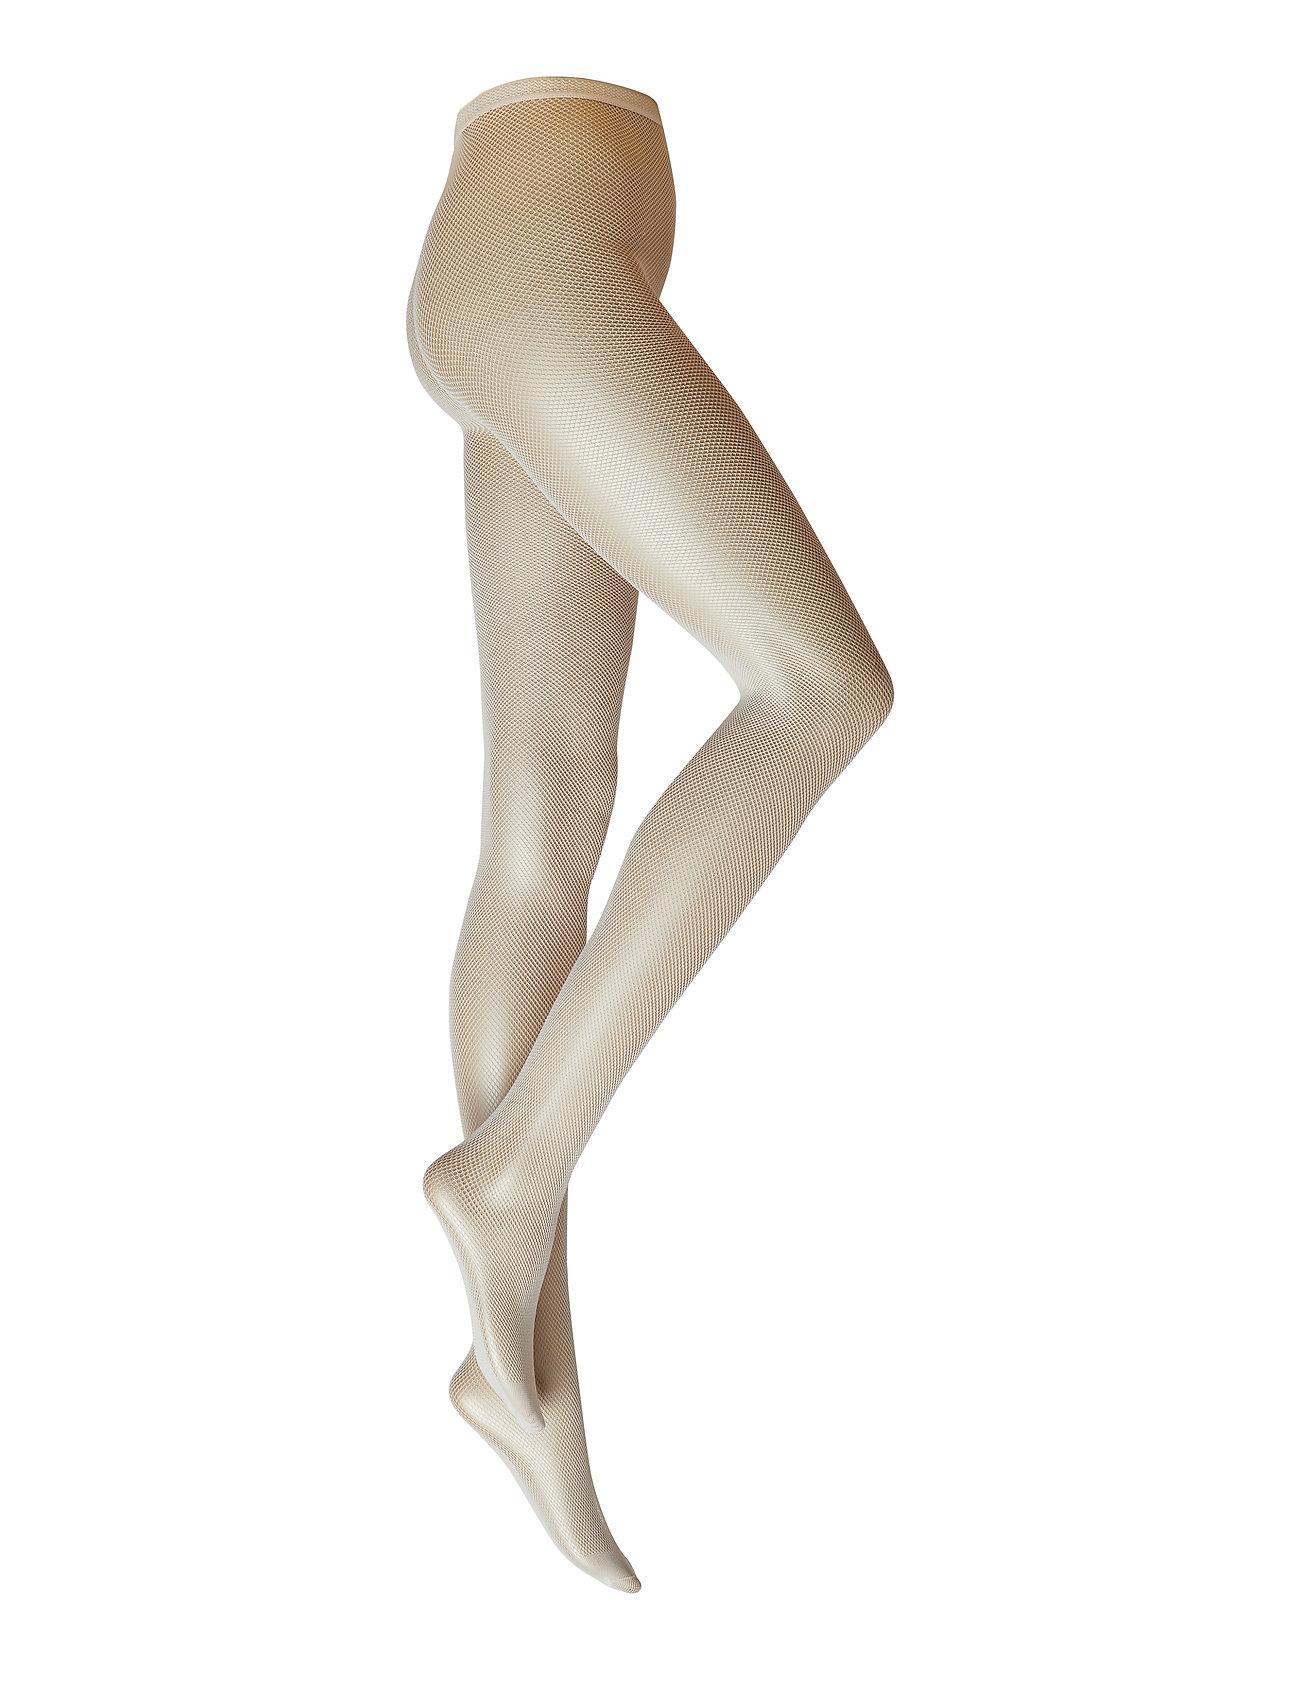 Swedish Stockings ELVIRA NET TIGHTS - IVORY